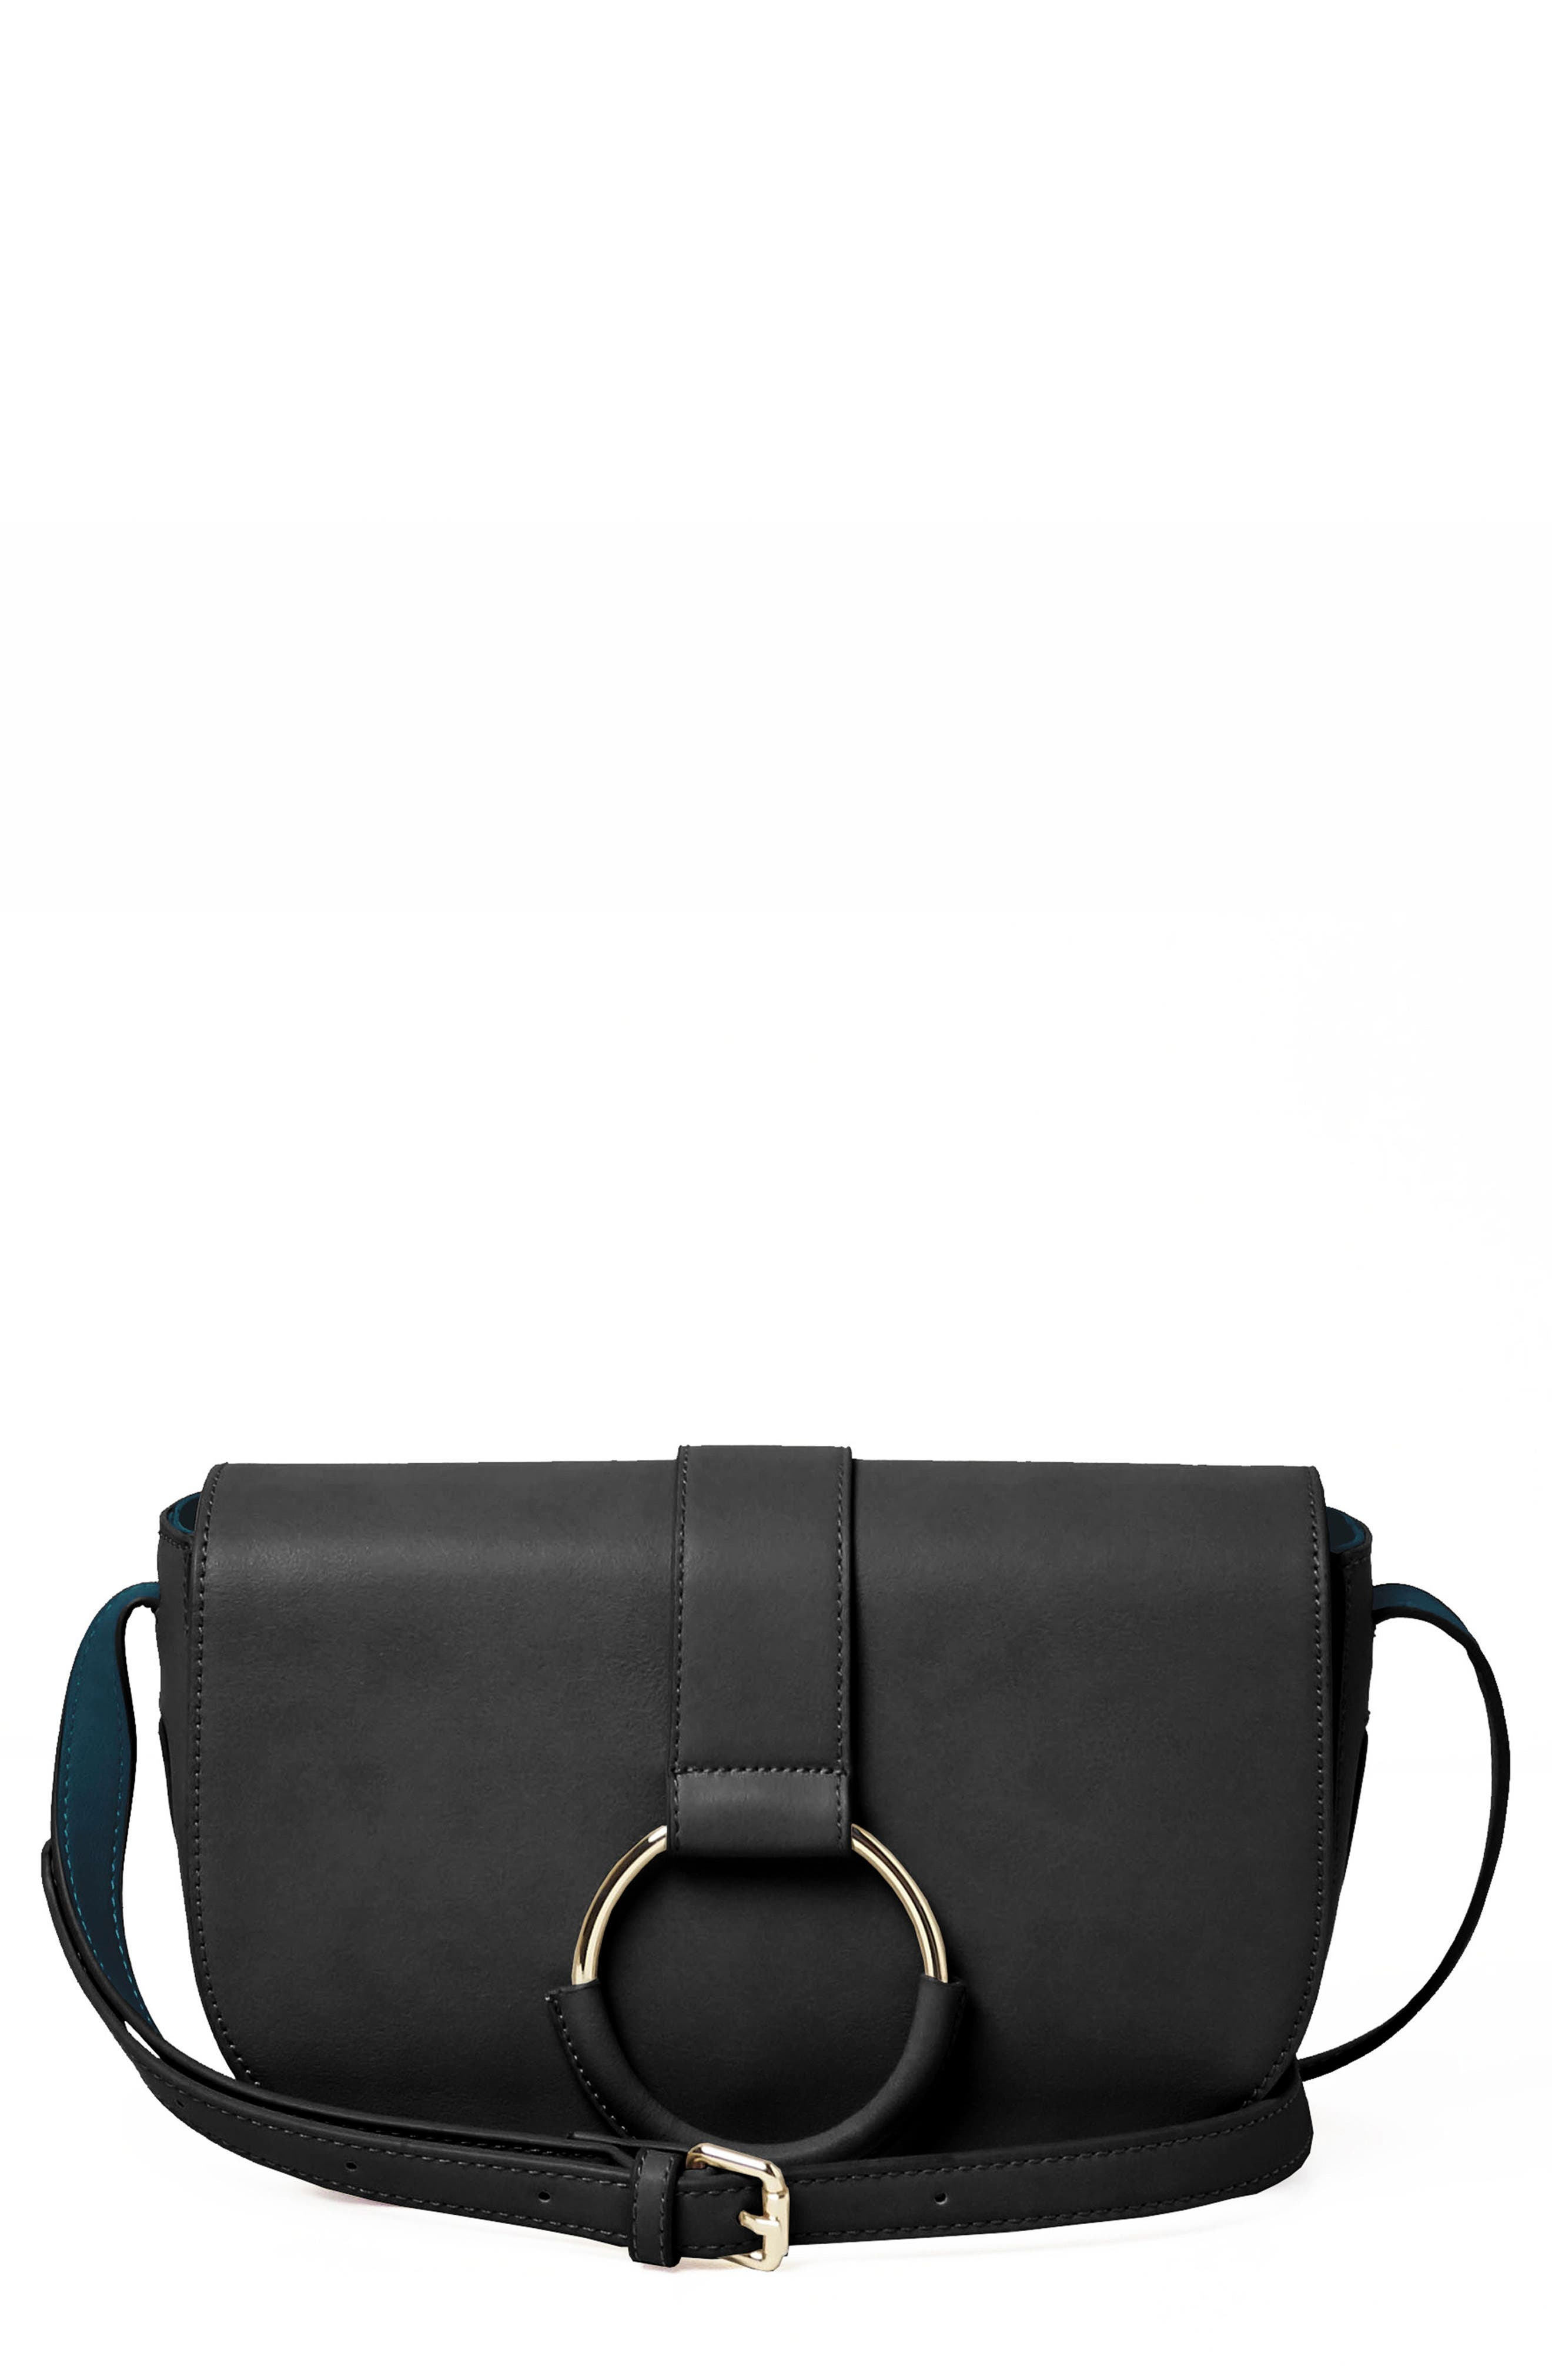 URBAN ORIGINALS Lolita Vegan Leather Crossbody Bag, Main, color, 001